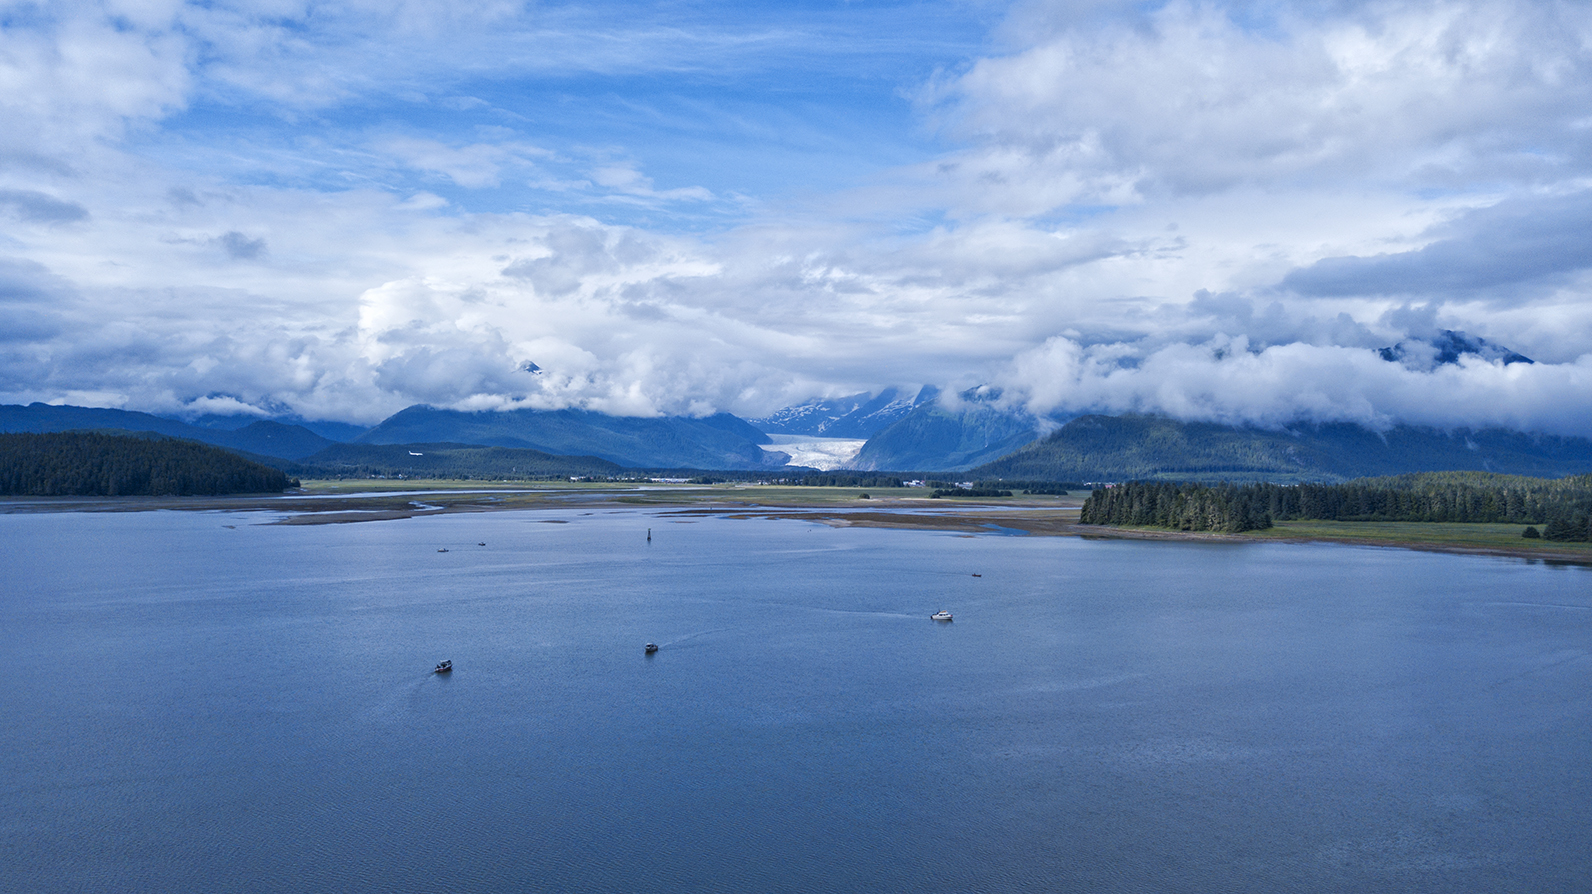 GlacierAlaska